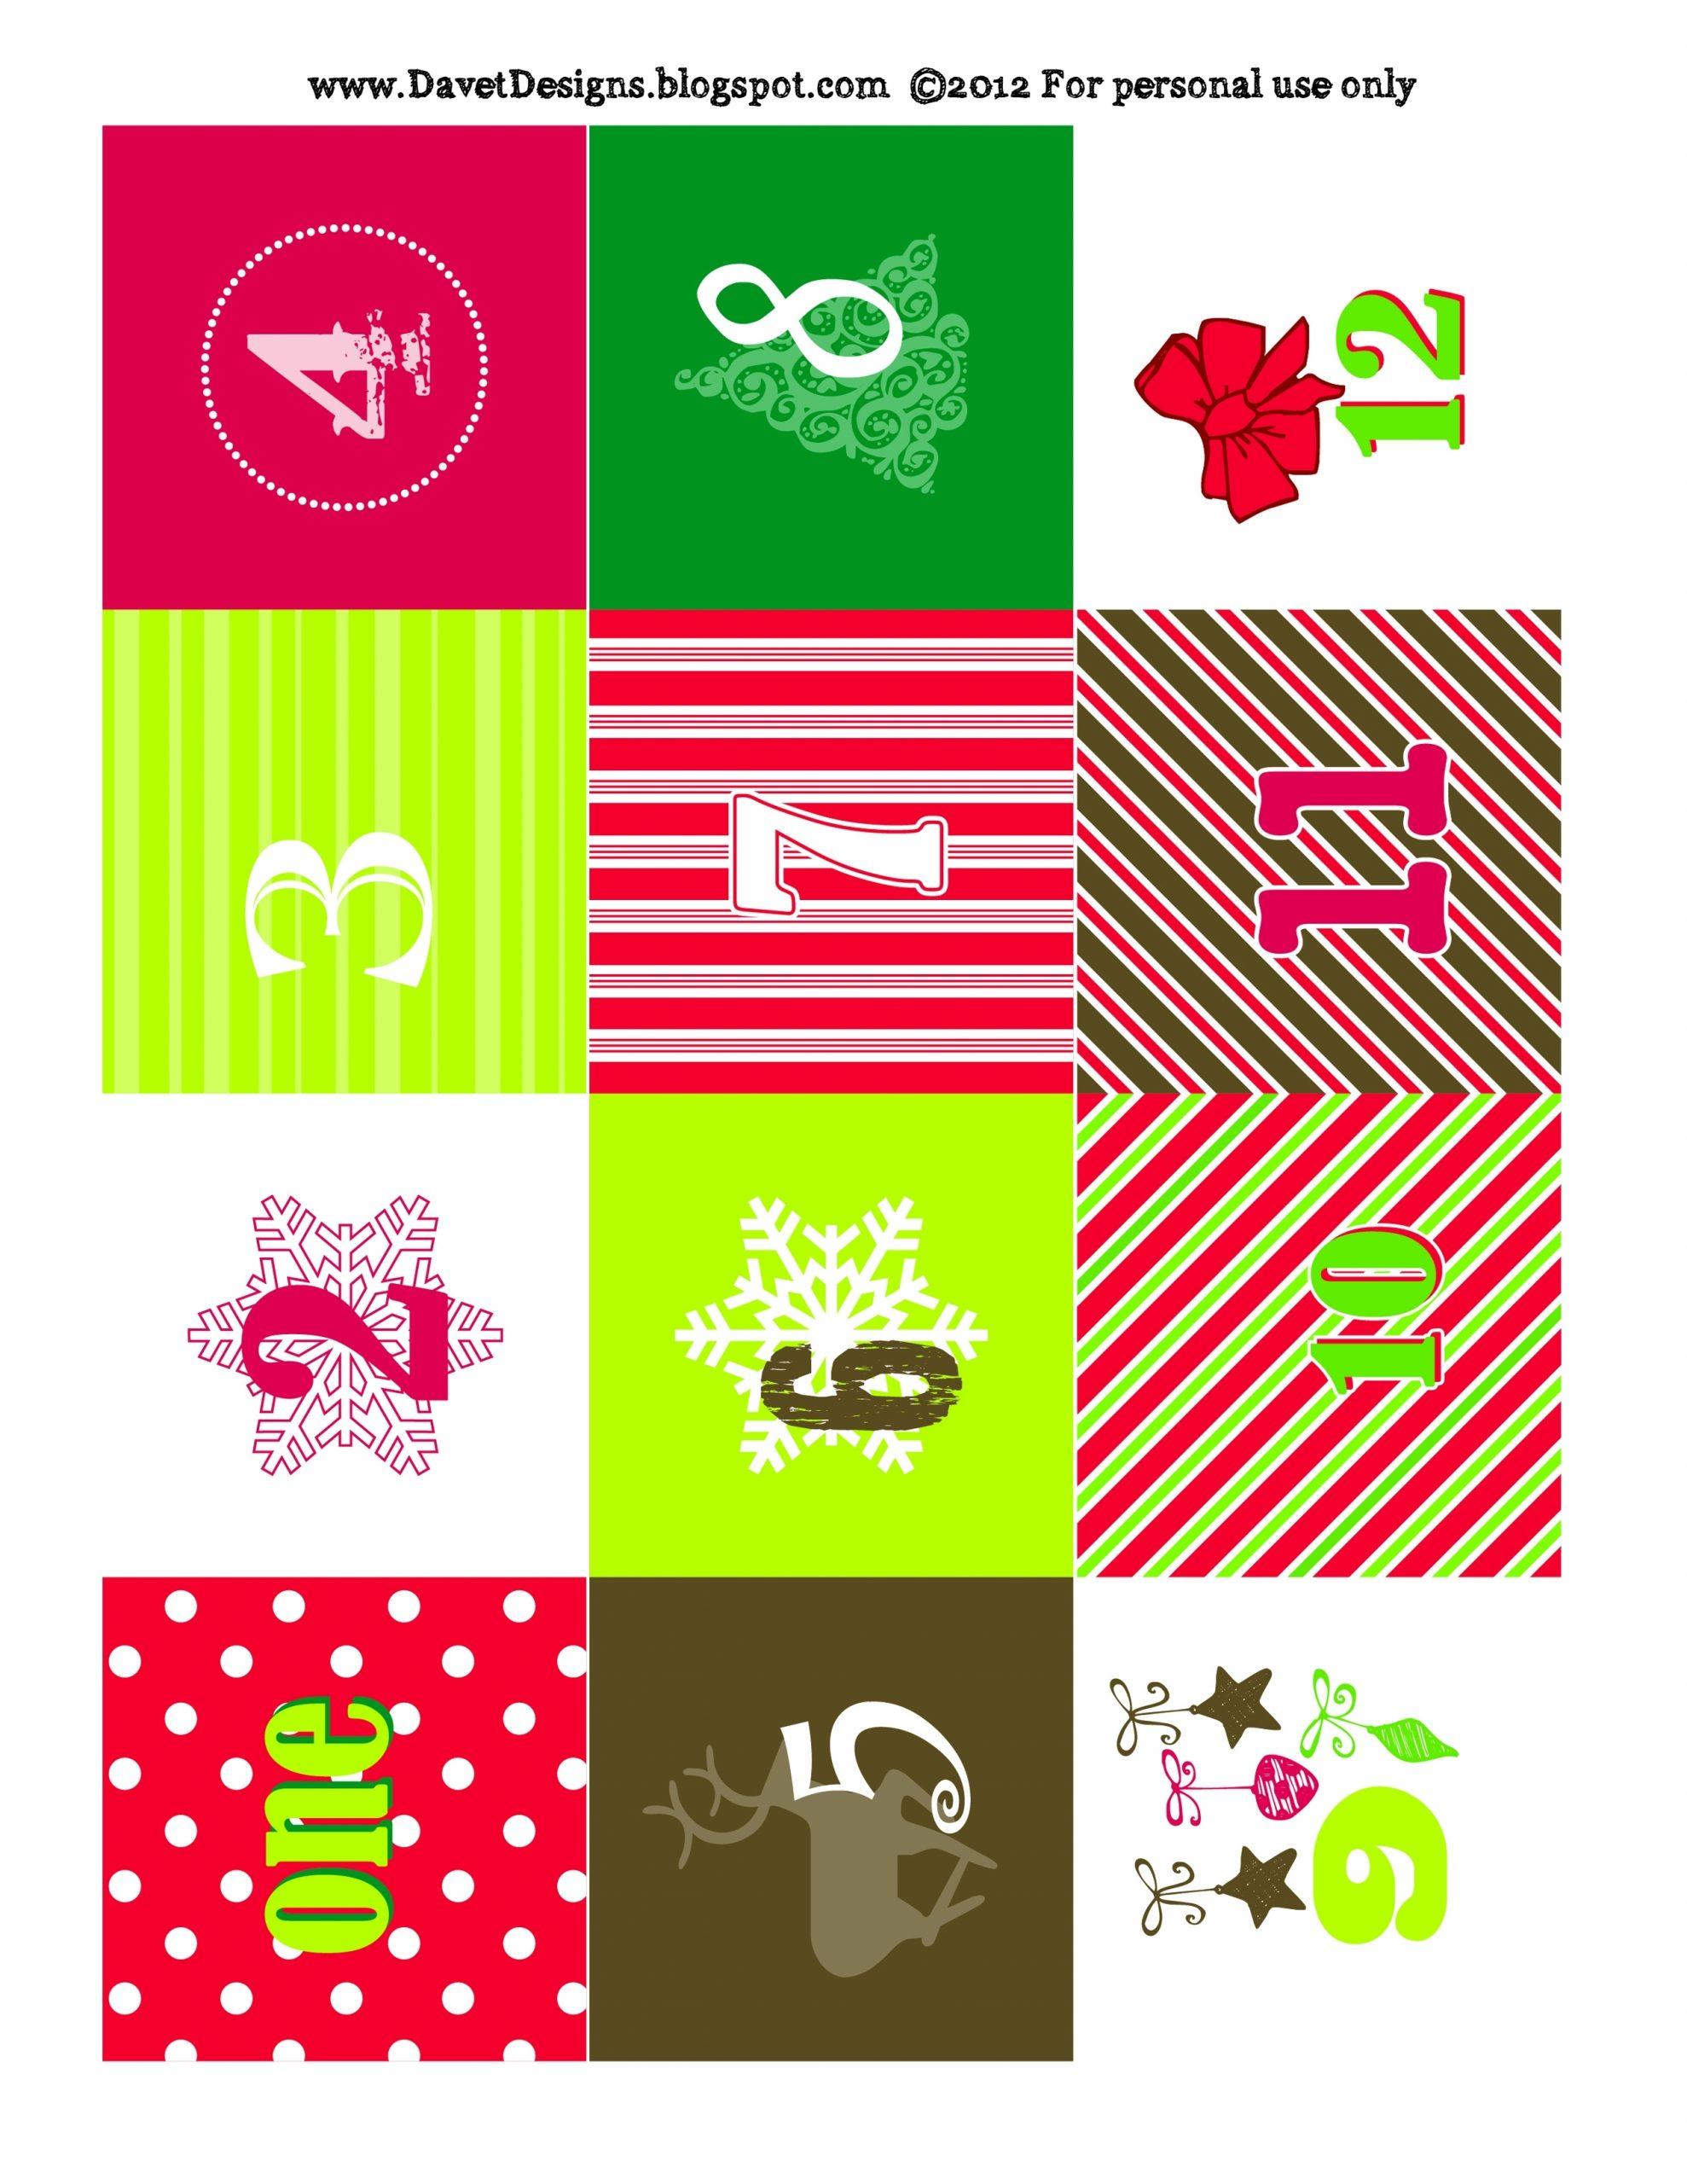 Craft Ideas And More From Davet Designs: Advent Calendar Diy